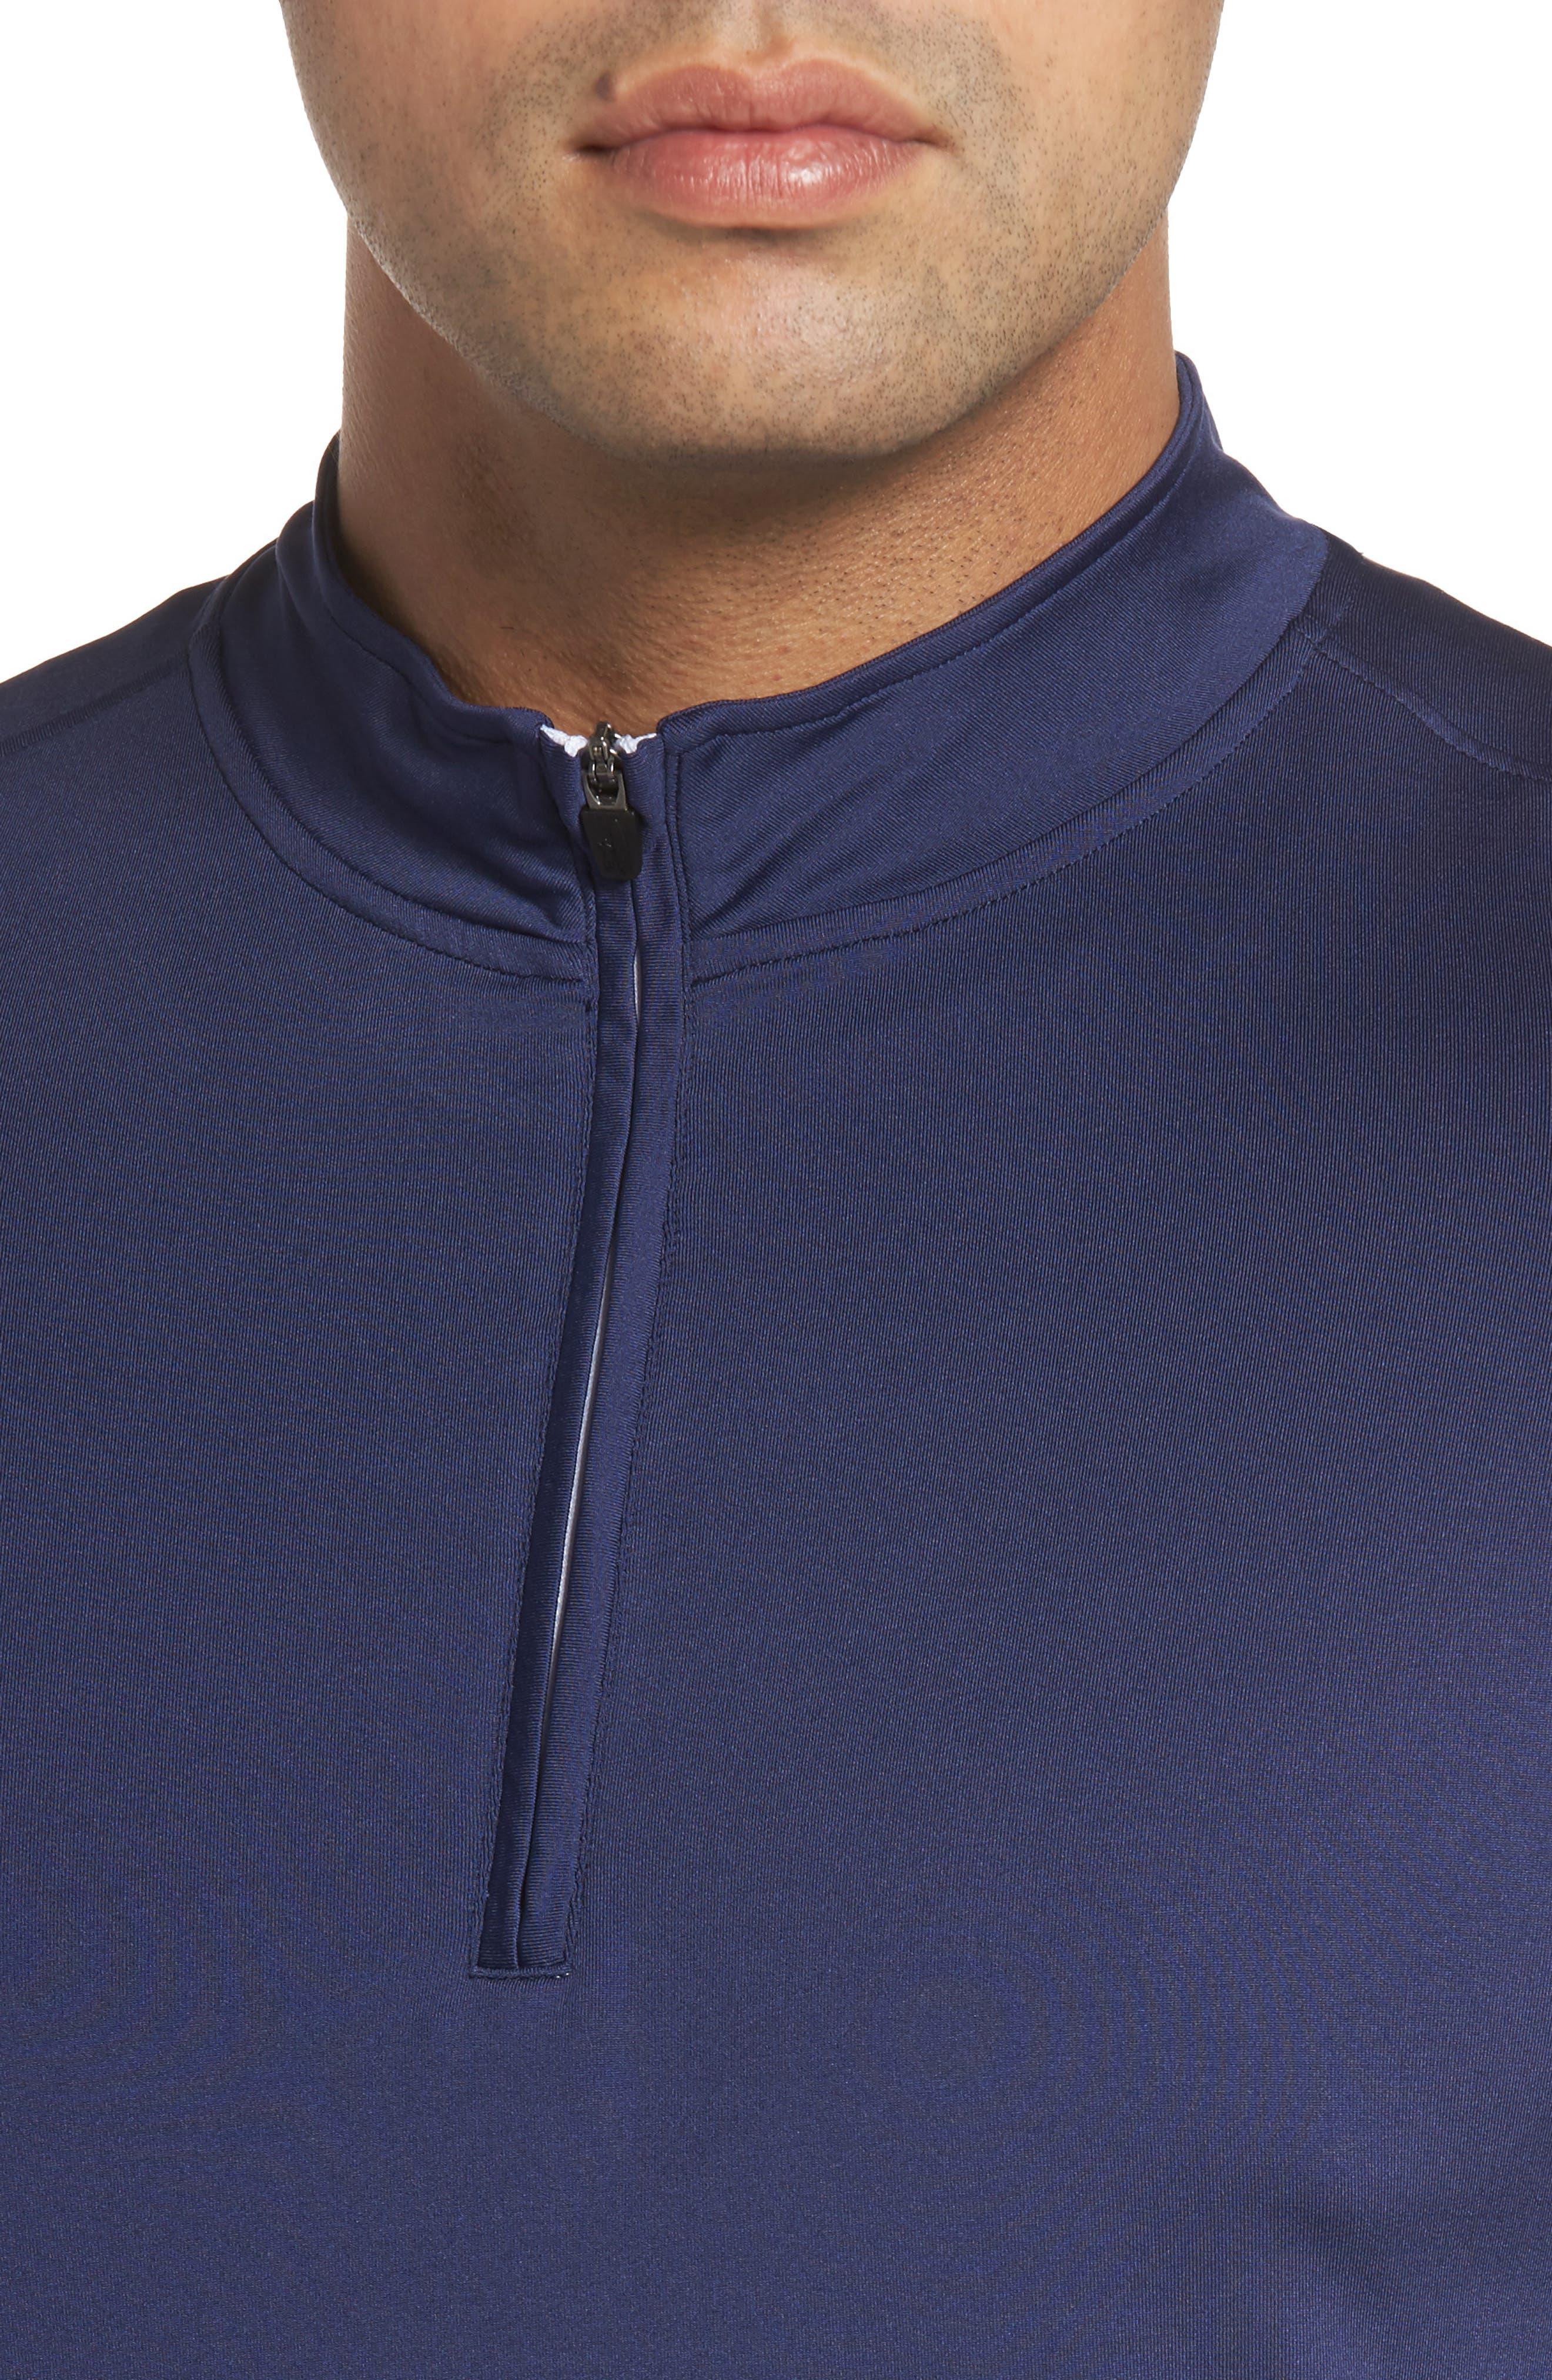 Flex Classic Fit Quarter Zip Pullover,                             Alternate thumbnail 4, color,                             Twilight